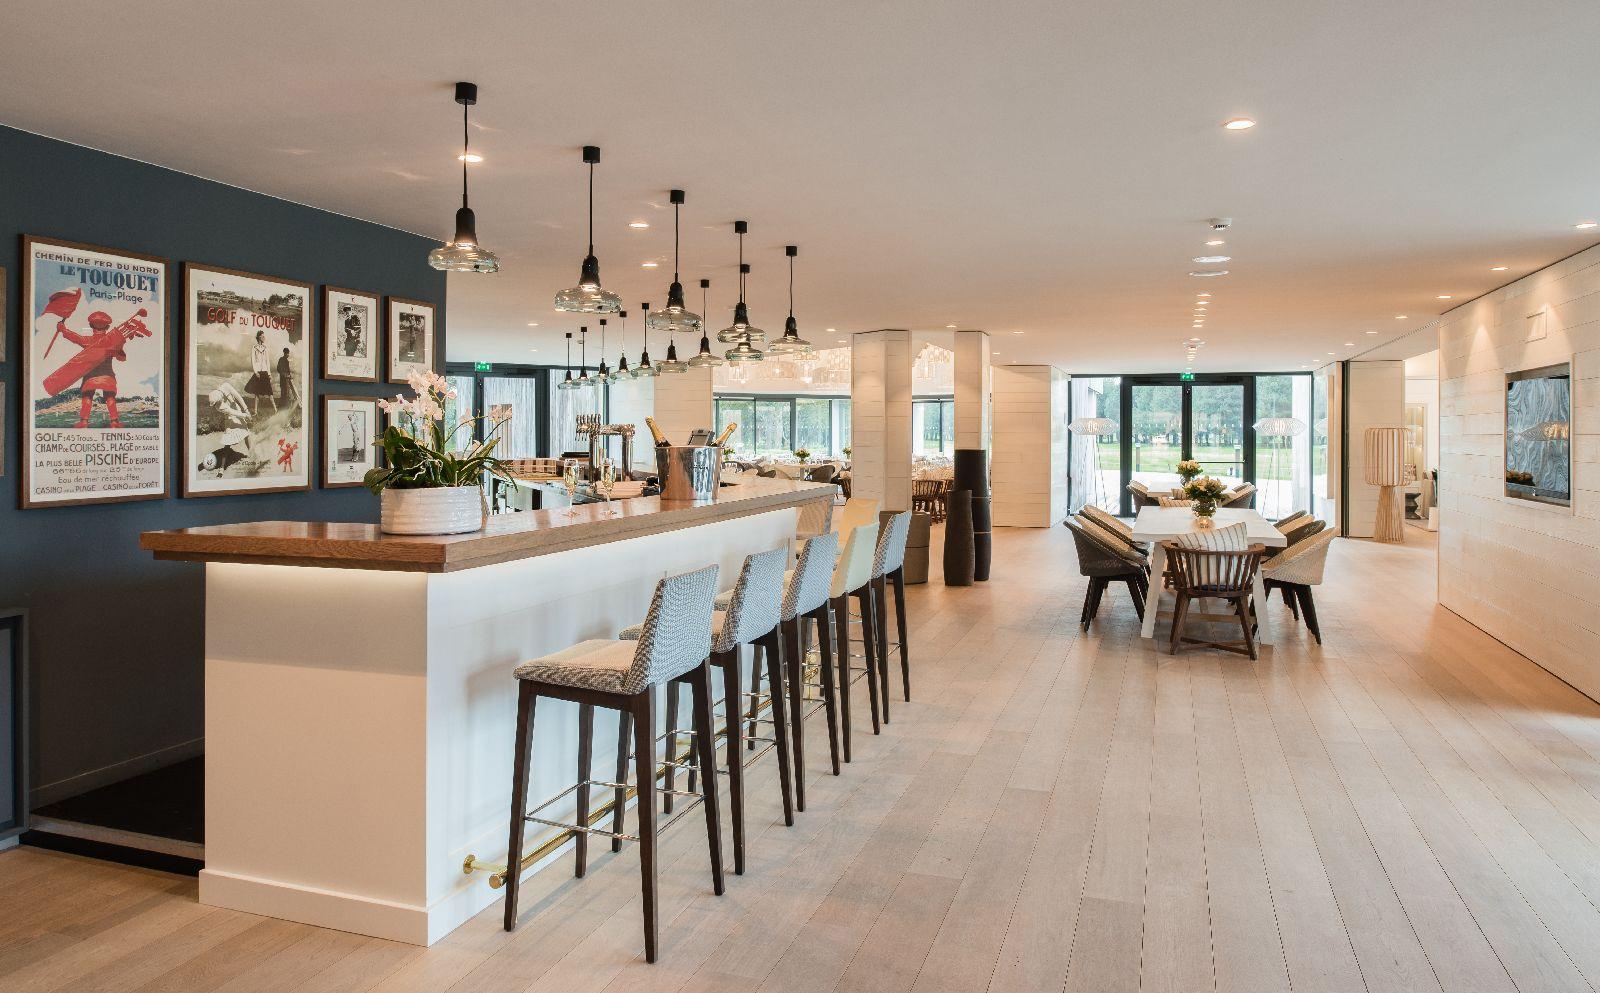 golf-expedition-golf-reizen-frankrijk-regio-pas-de-calais-le-manoir-hotel-stijlvolle-bar-met-zit-ruimte.jpg